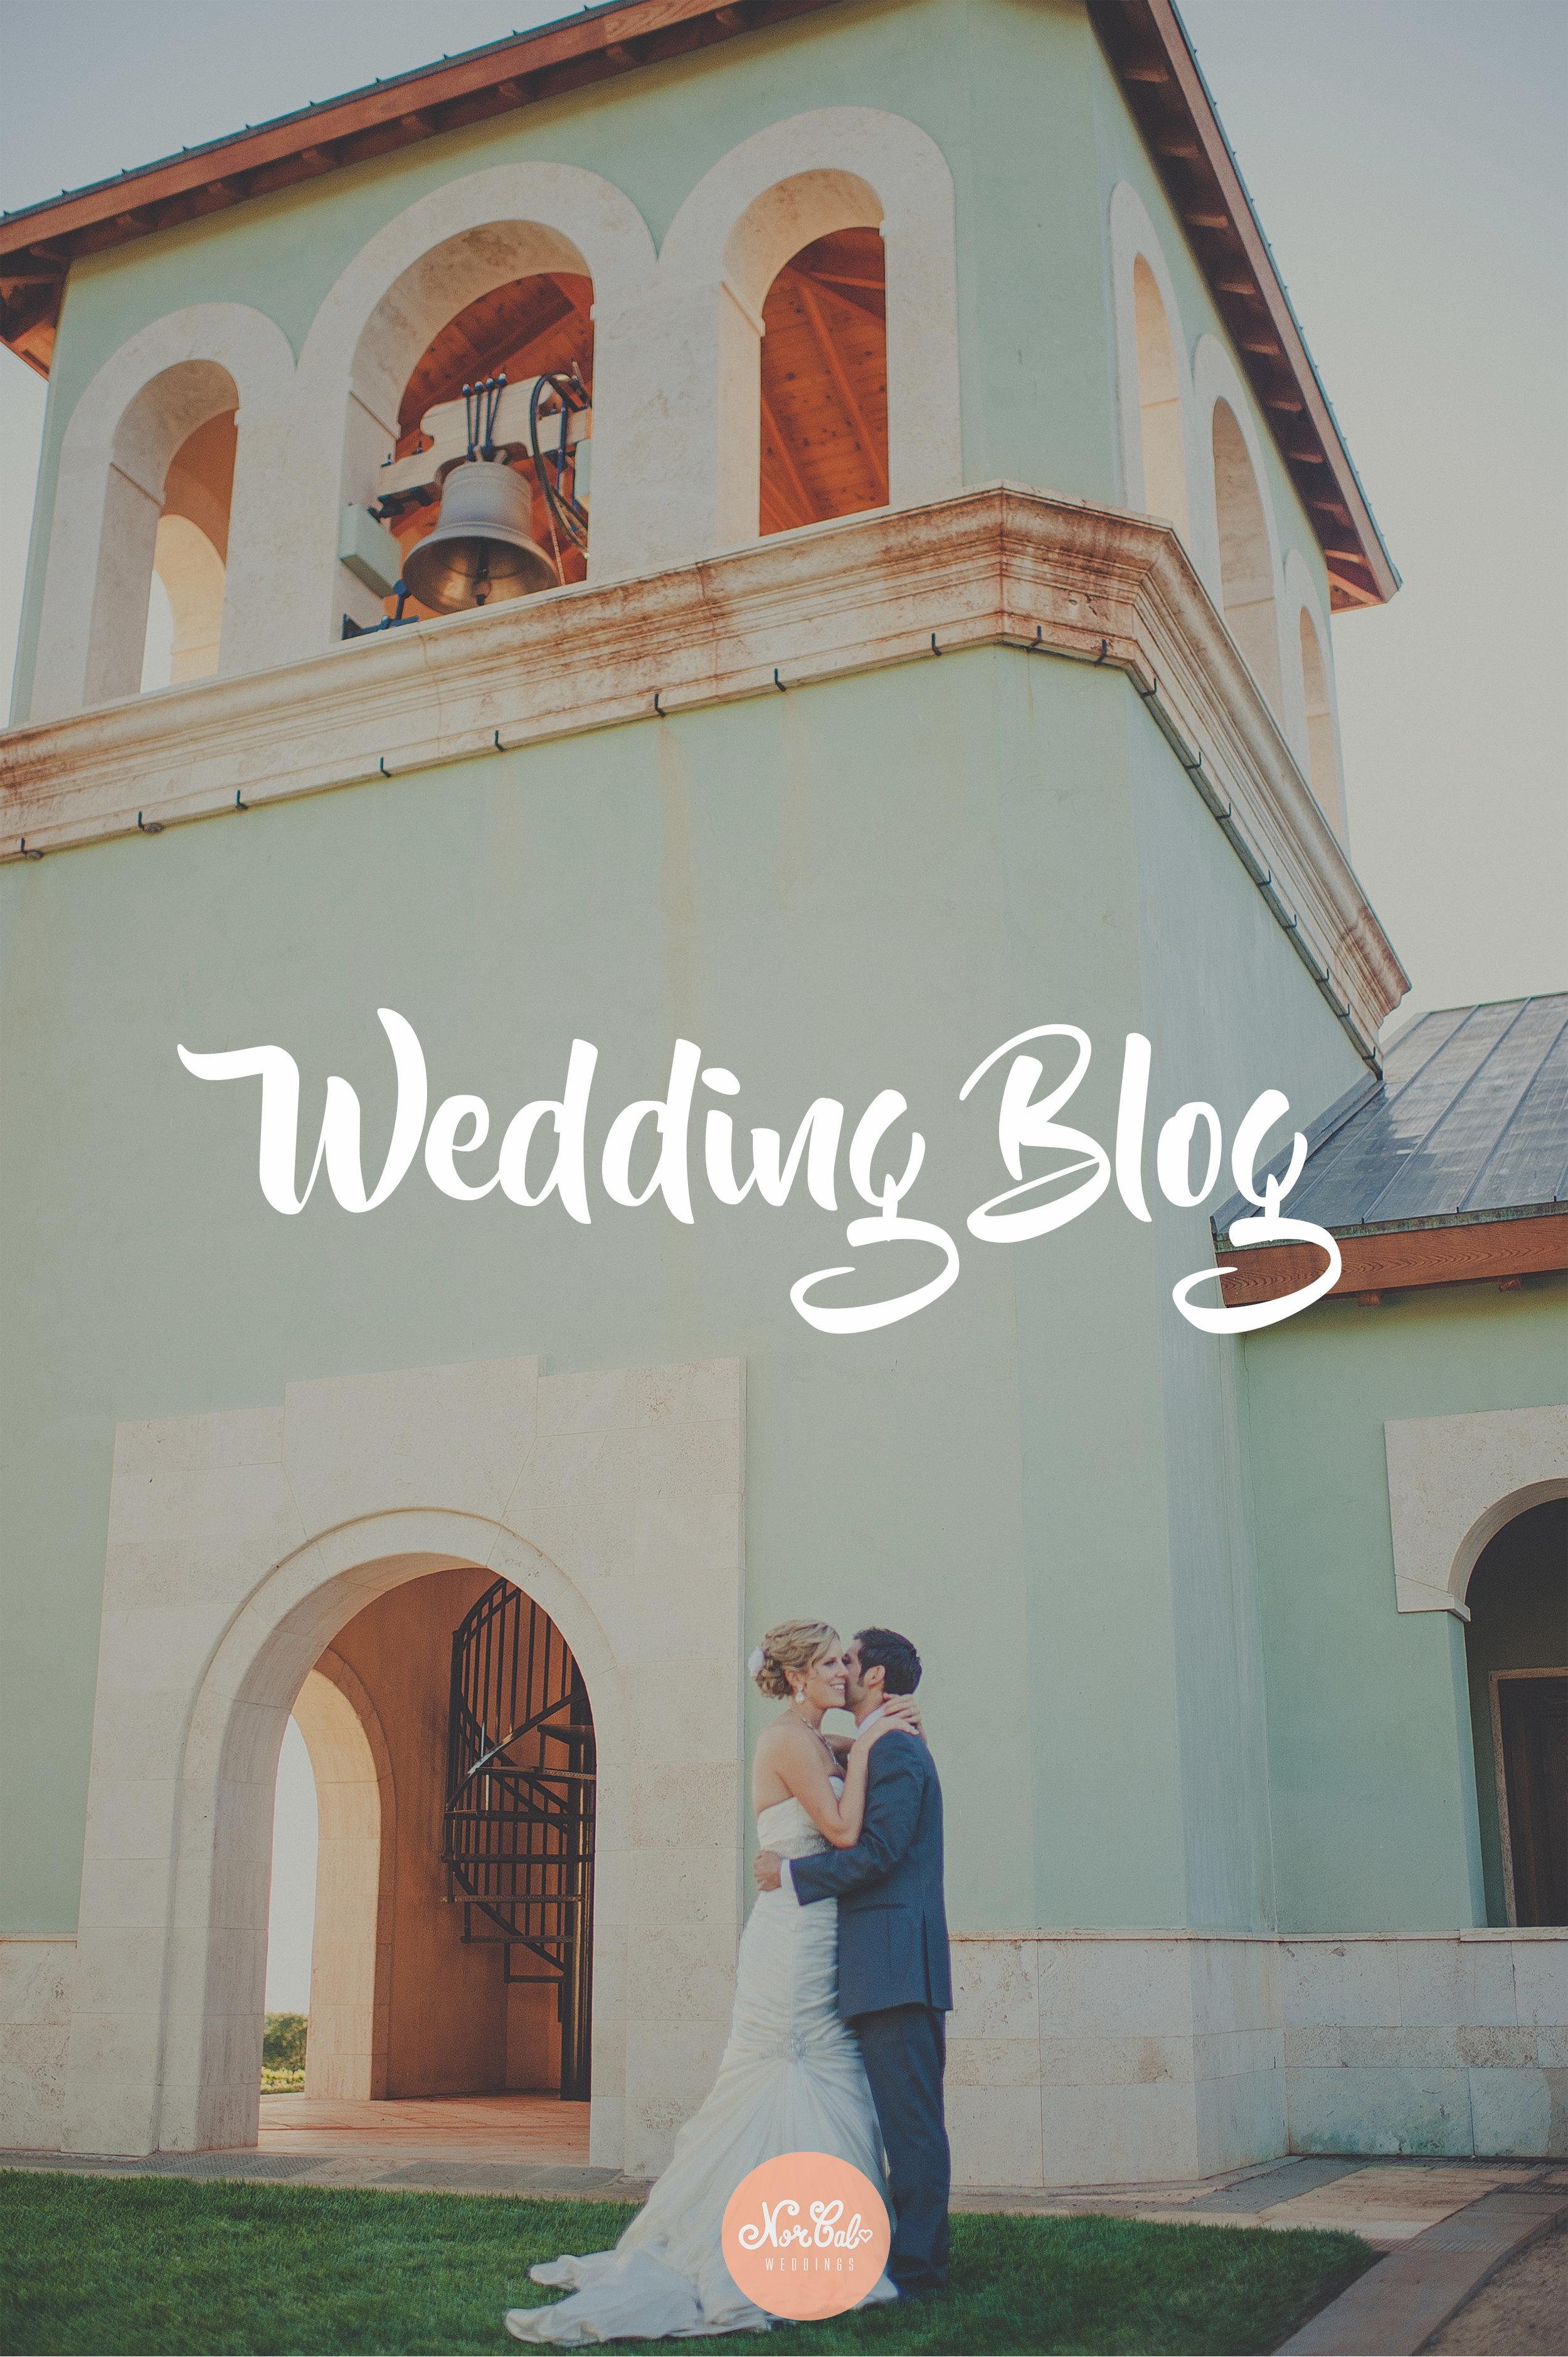 NorCal Weddings Blog.jpg